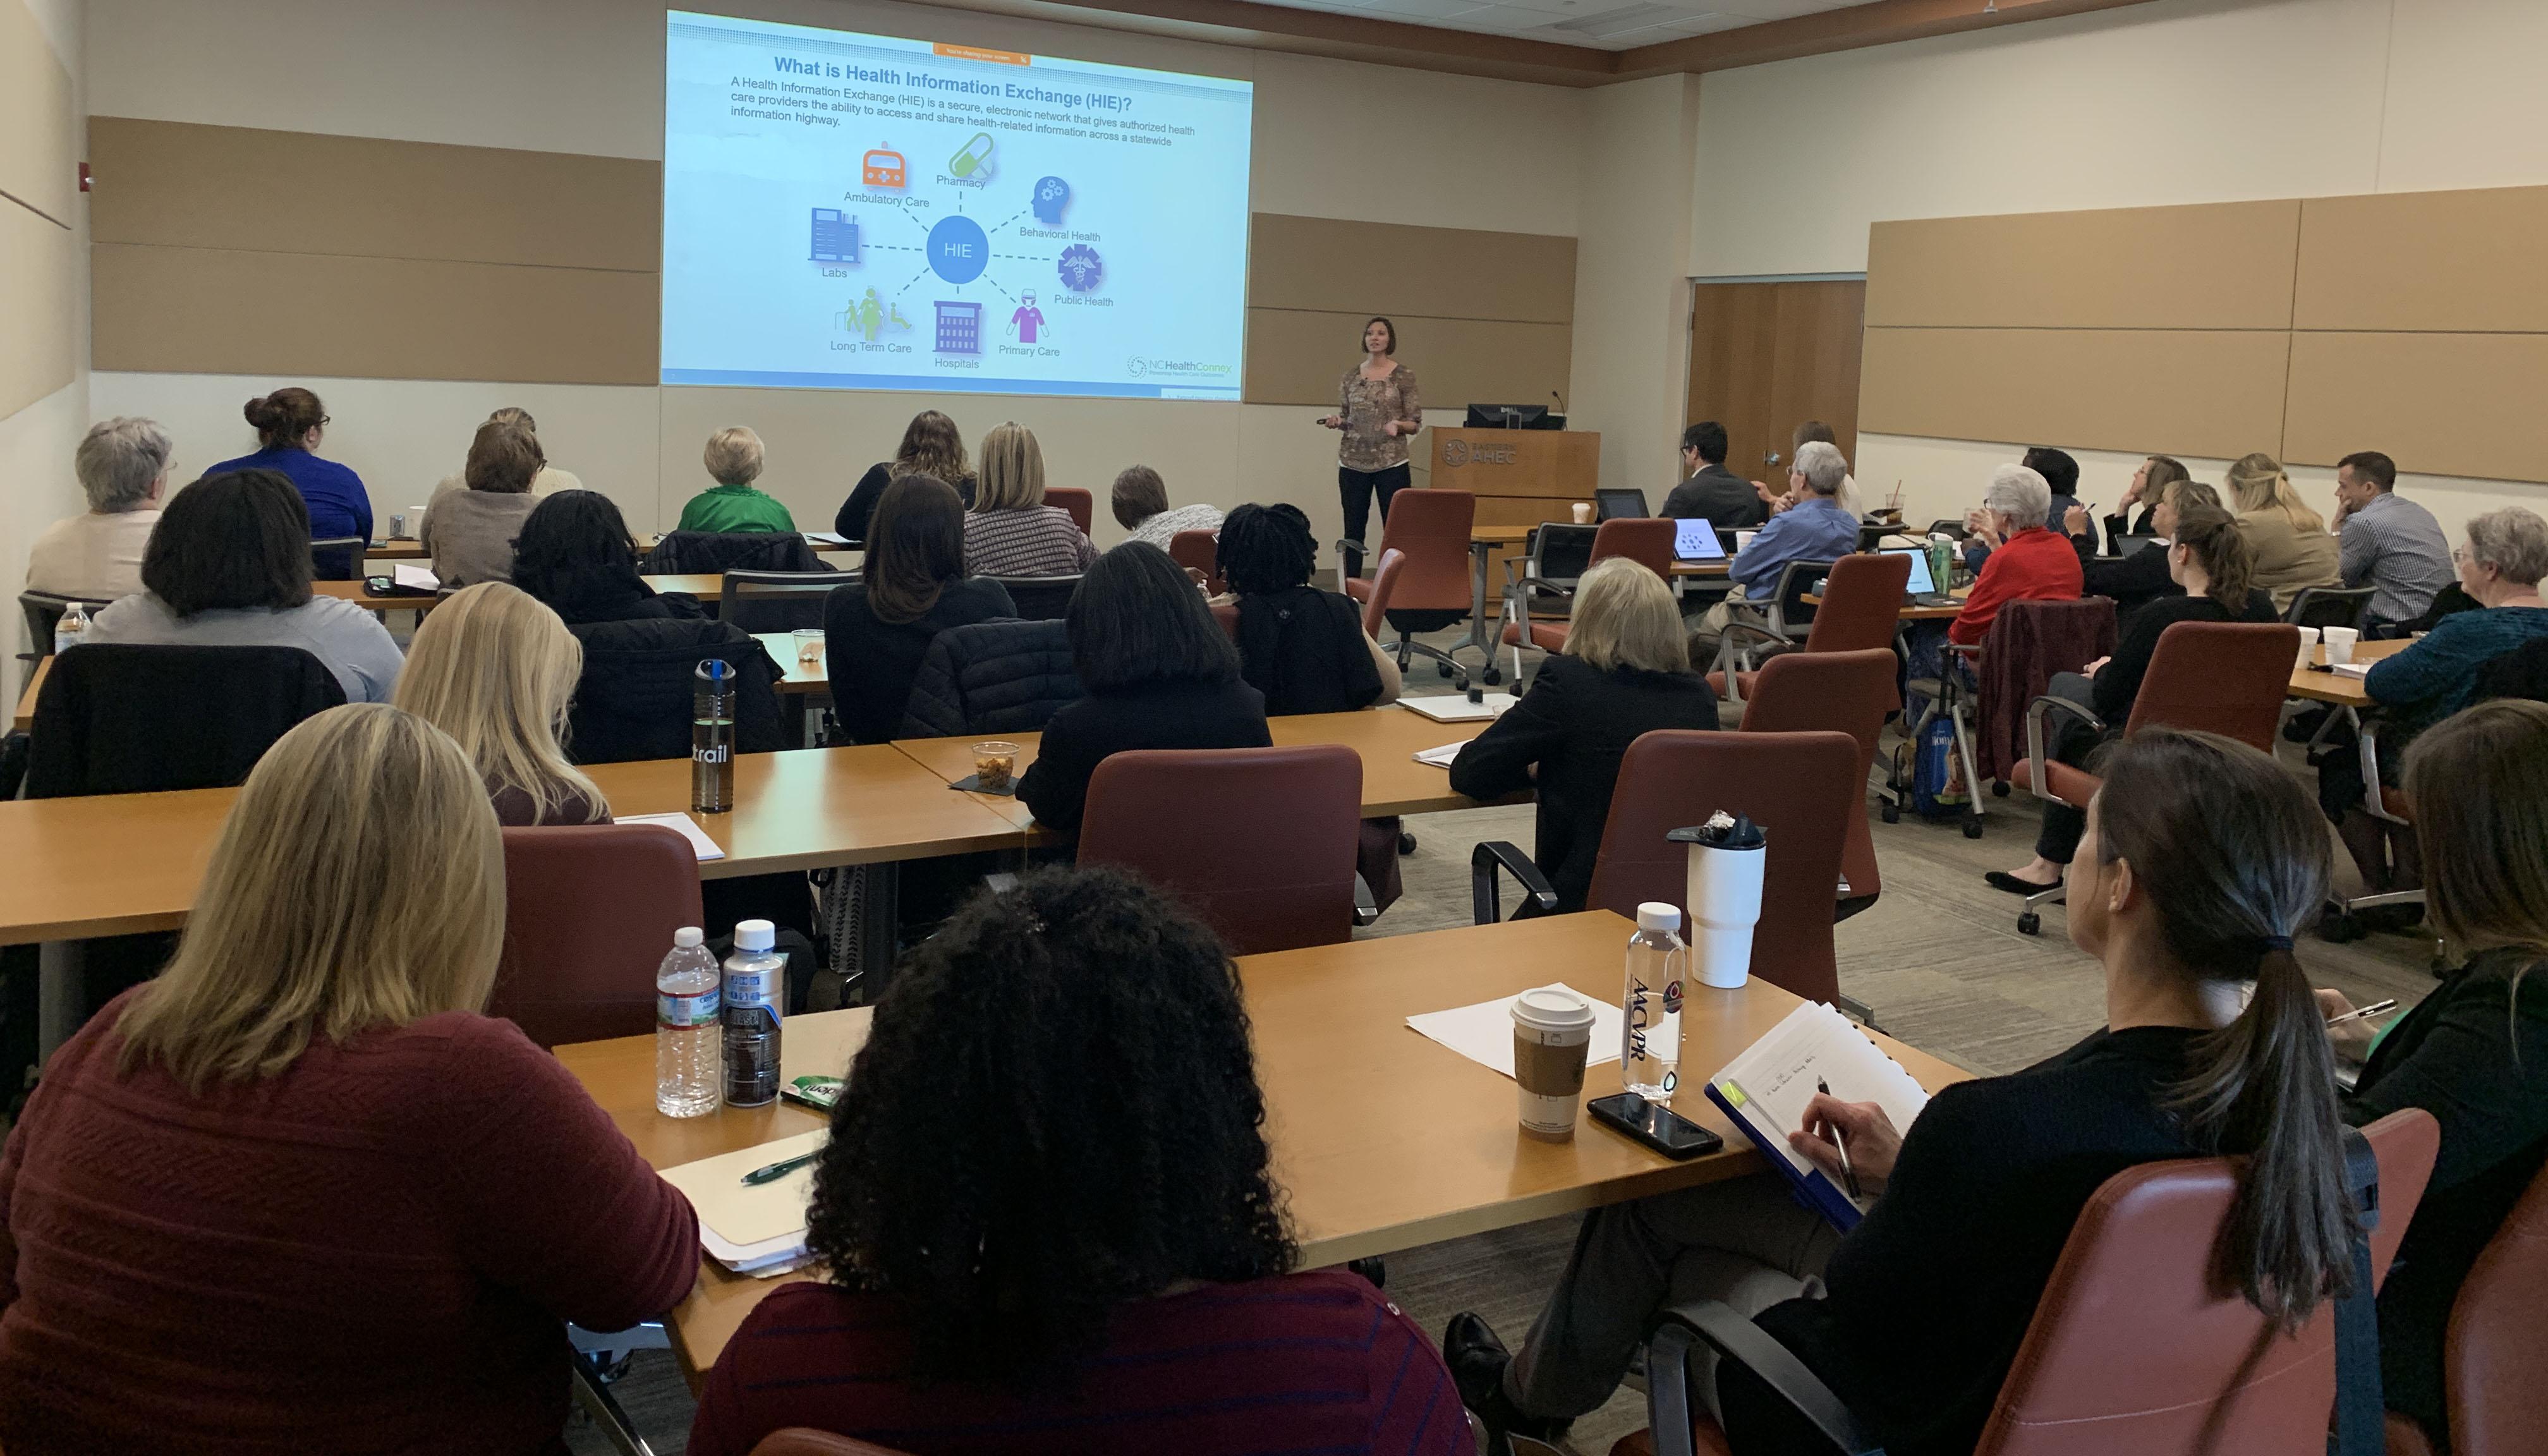 North Carolina Health Information Exchange Authority presentation at the Rural Health Symposium